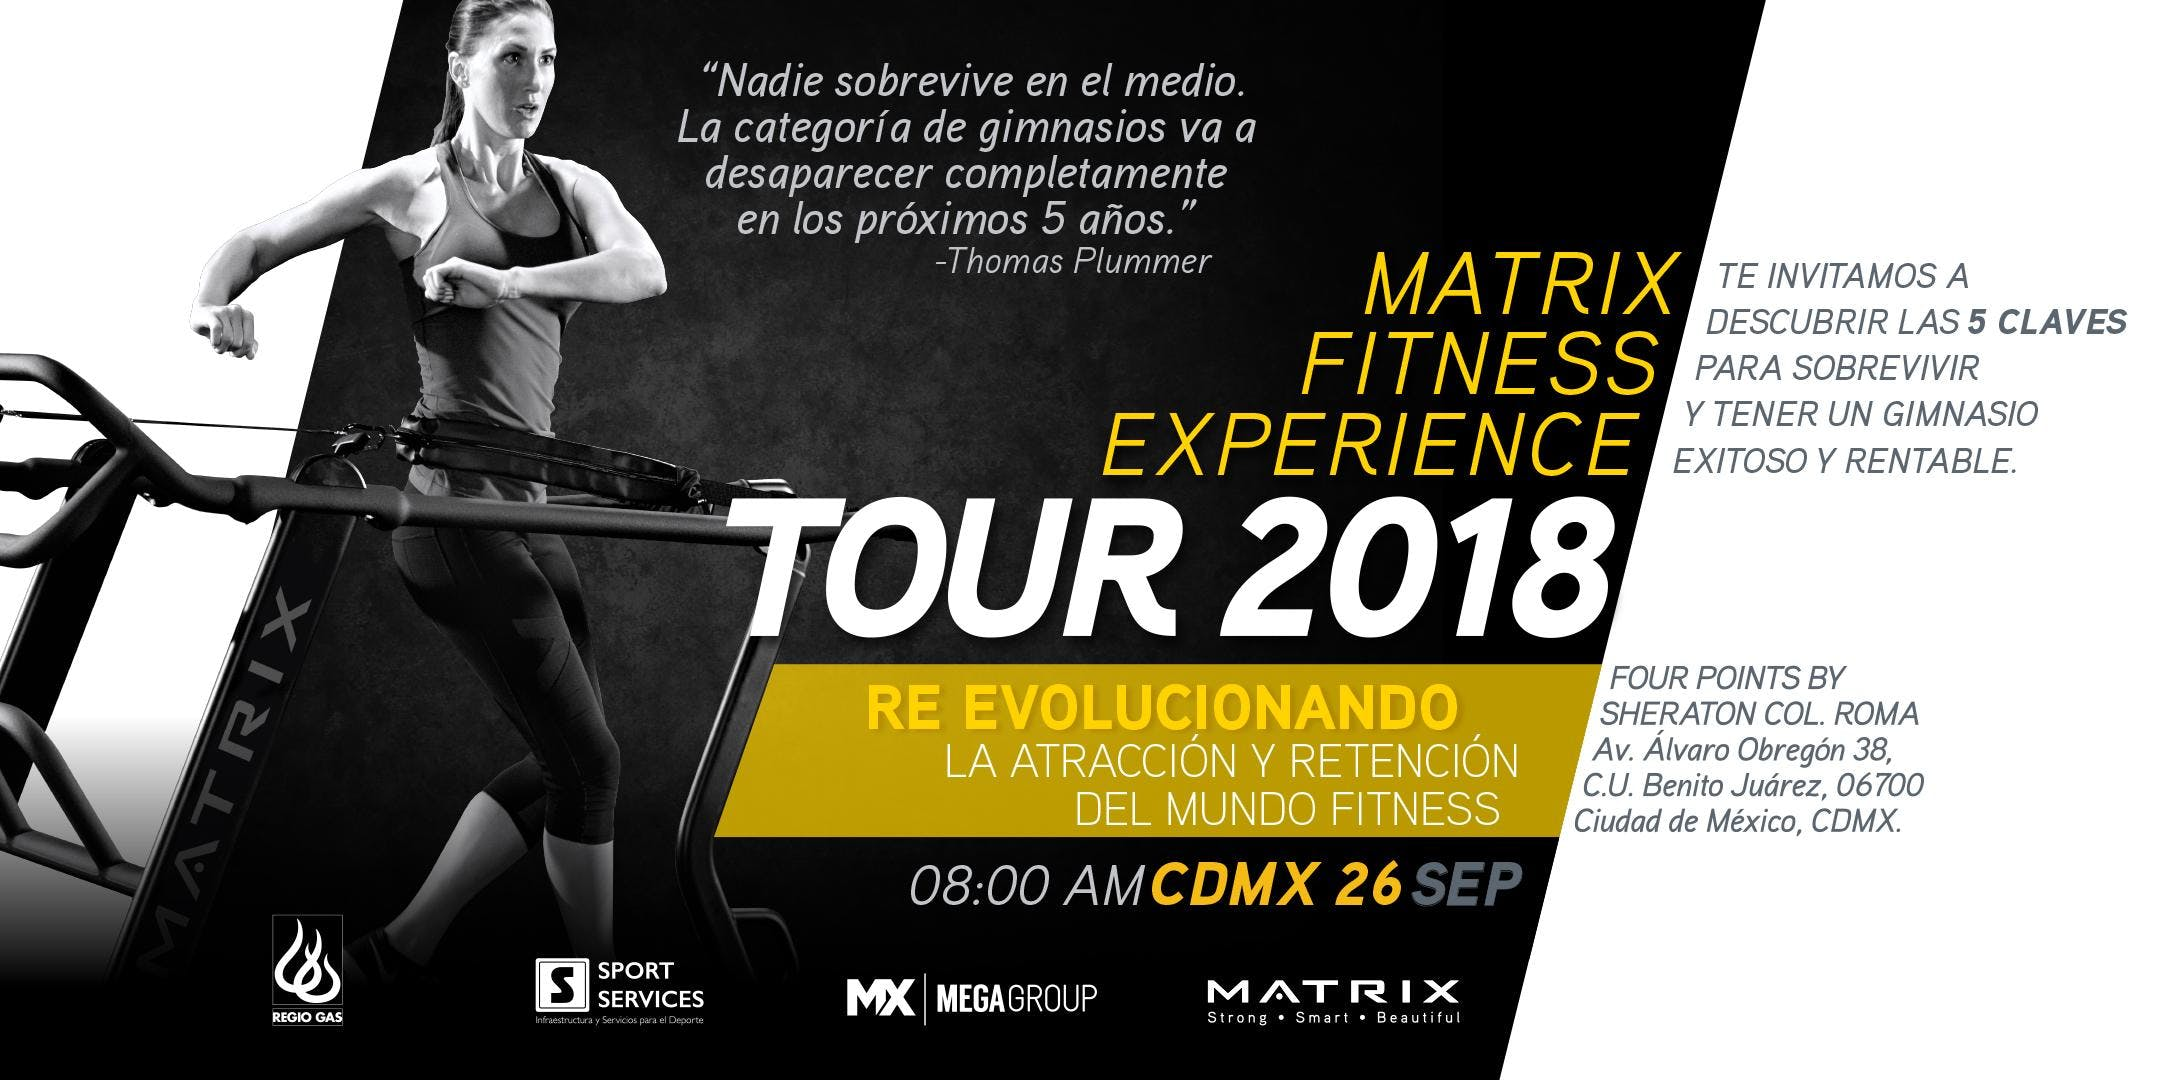 Matrix Fitness Experience Tour CDMX